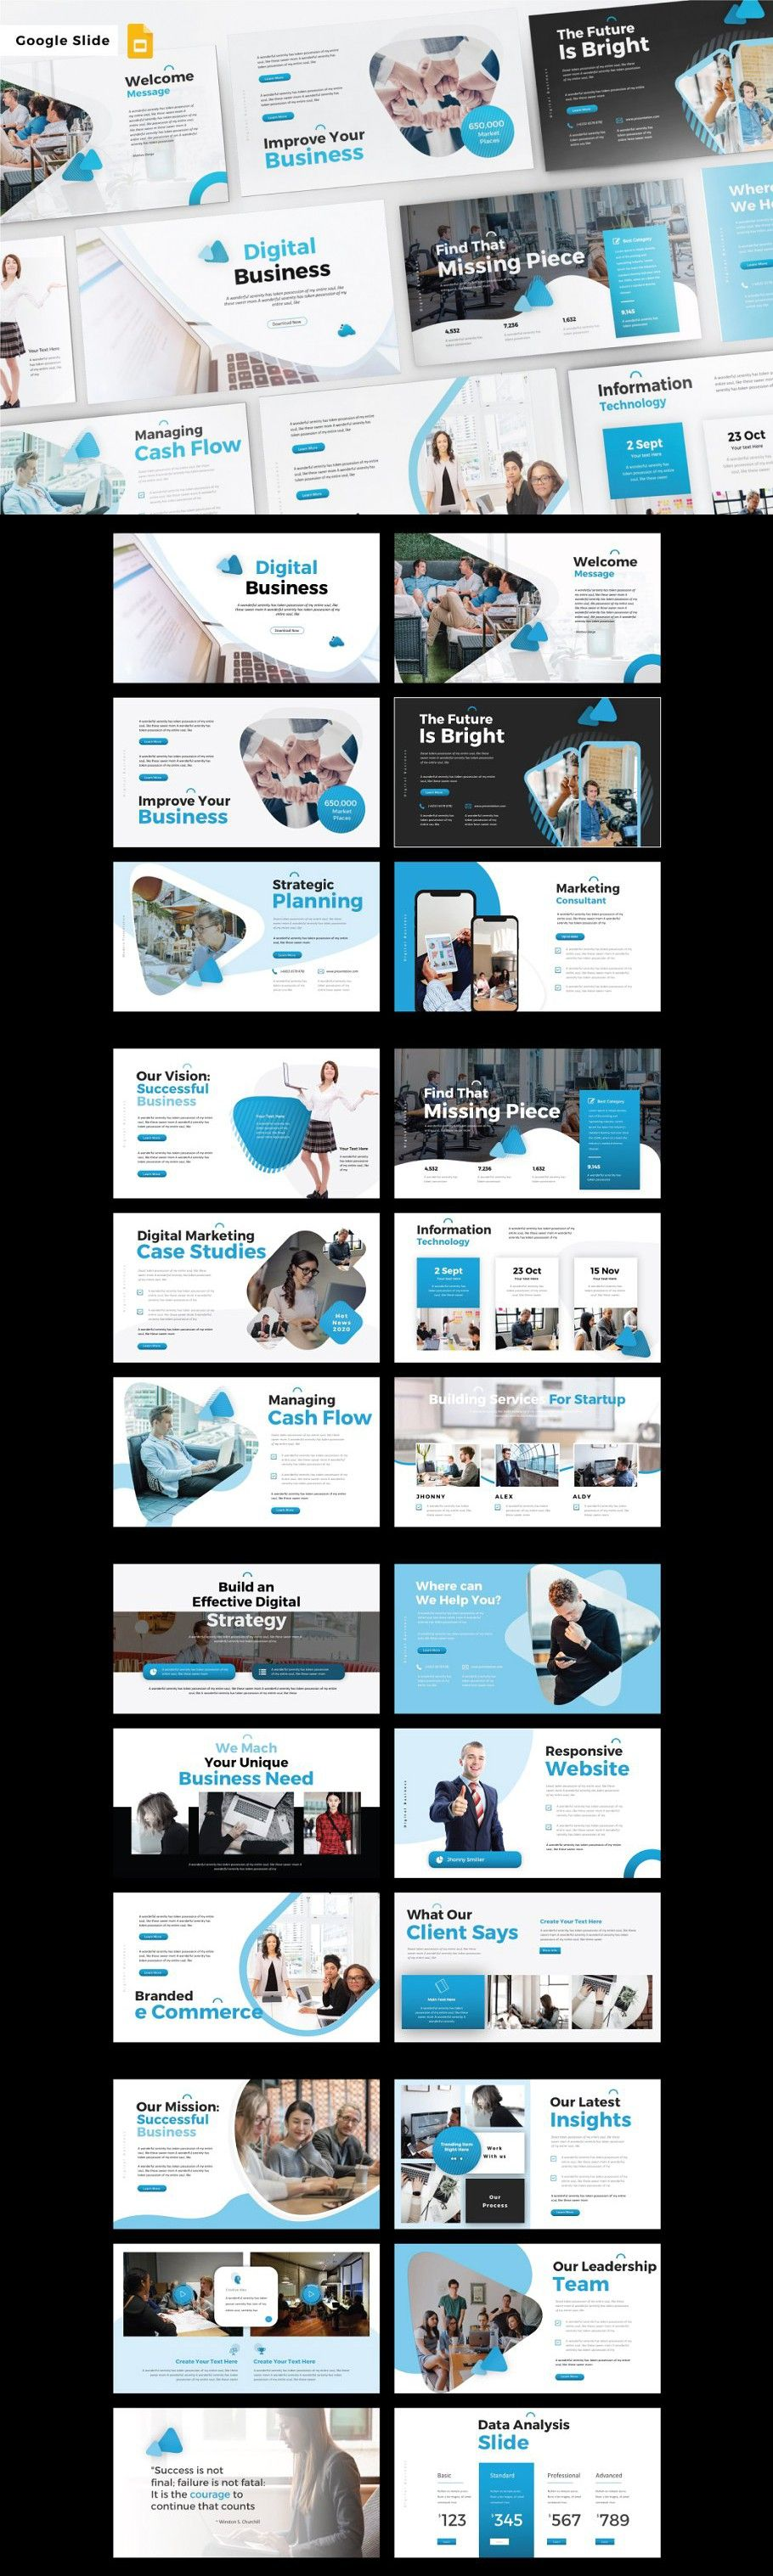 DIGITAL BUSINESSGoogle Slide in 2020 Business